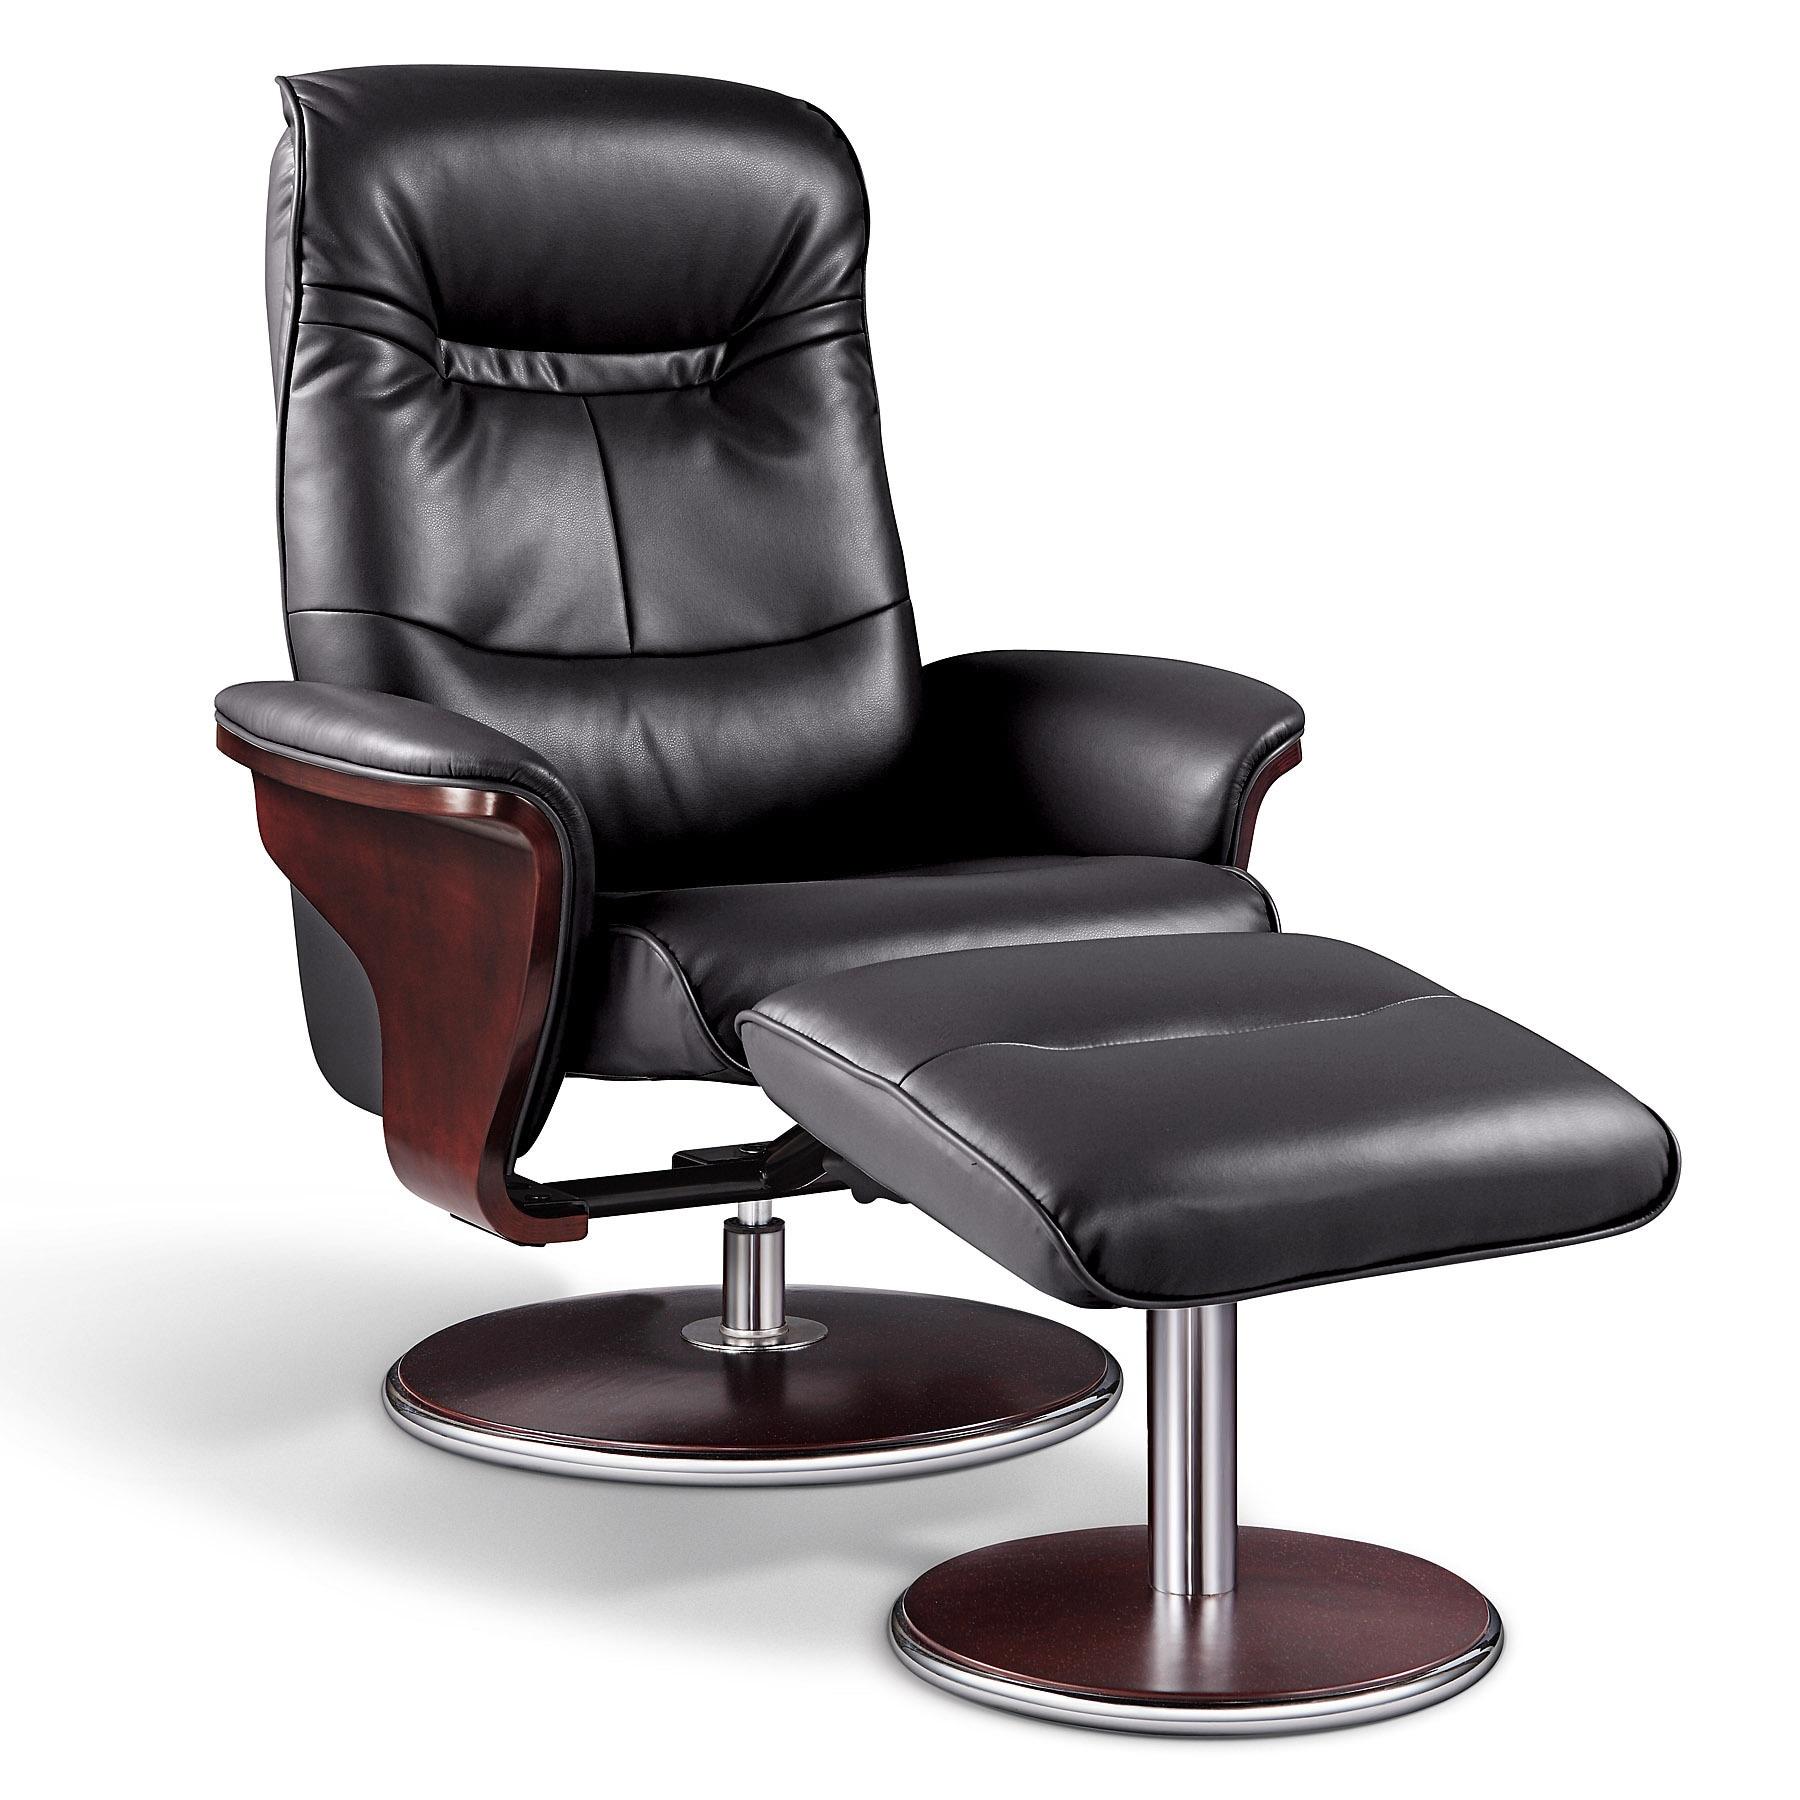 artiva usa 'milano' modern bend wood black leather swivel recliner withottoman set  free shipping today  overstockcom  . artiva usa 'milano' modern bend wood black leather swivel recliner